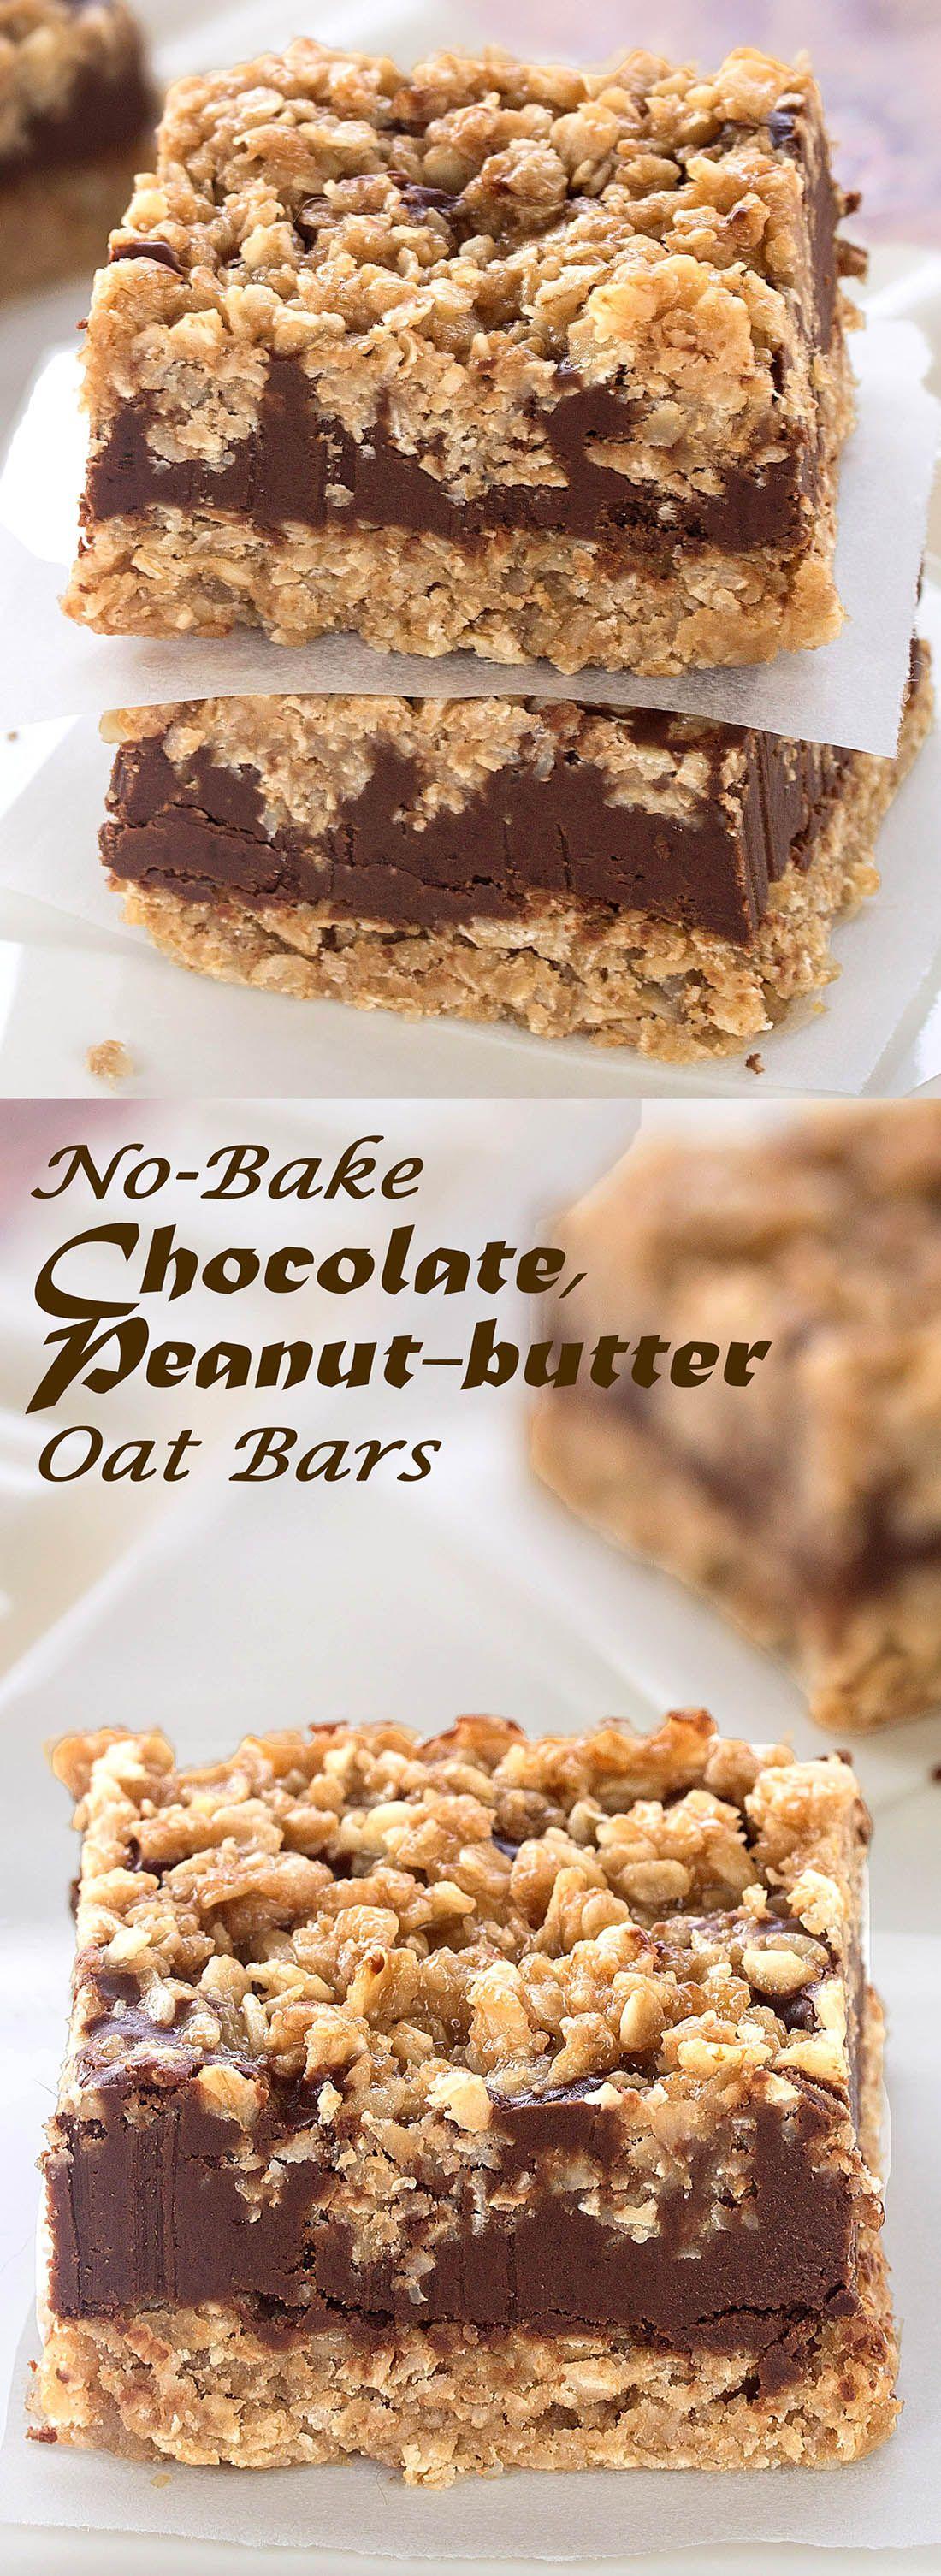 No-Bake Chocolate, Peanut-butter Oat Bars | Recipe ...